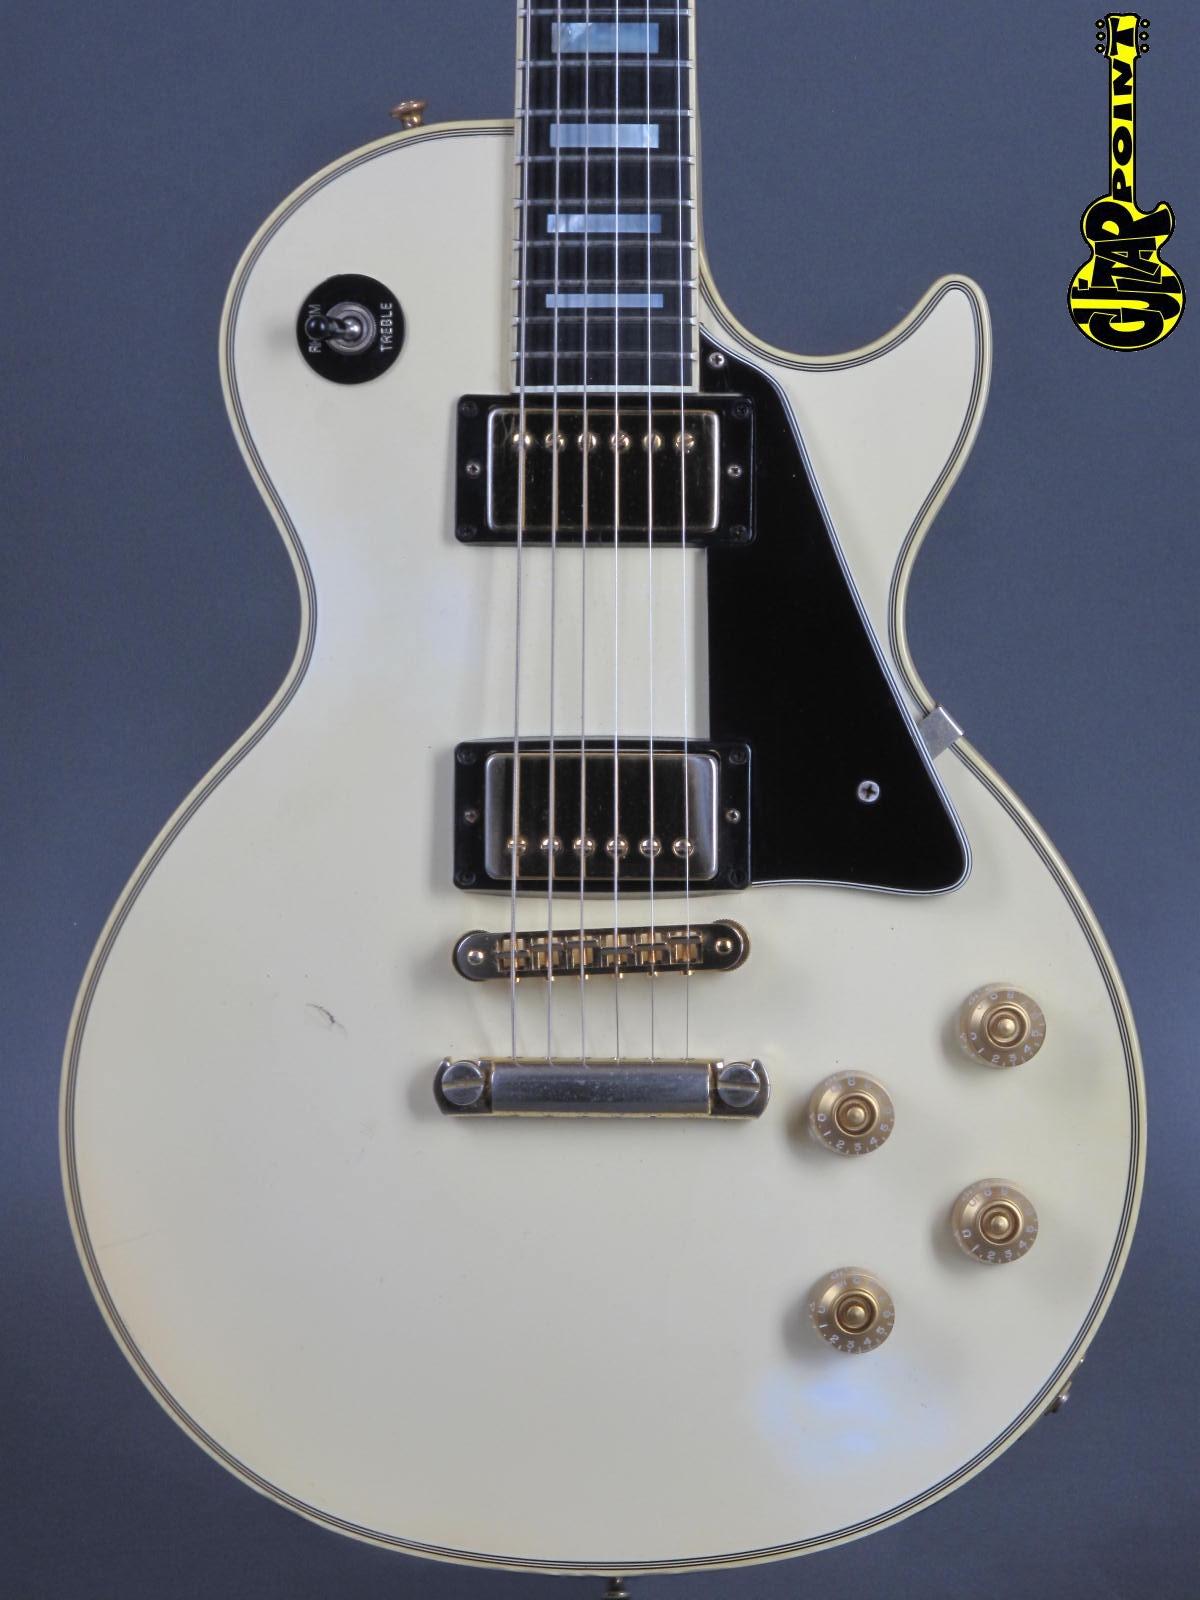 1988 Gibson Les Paul Custom - Creme White